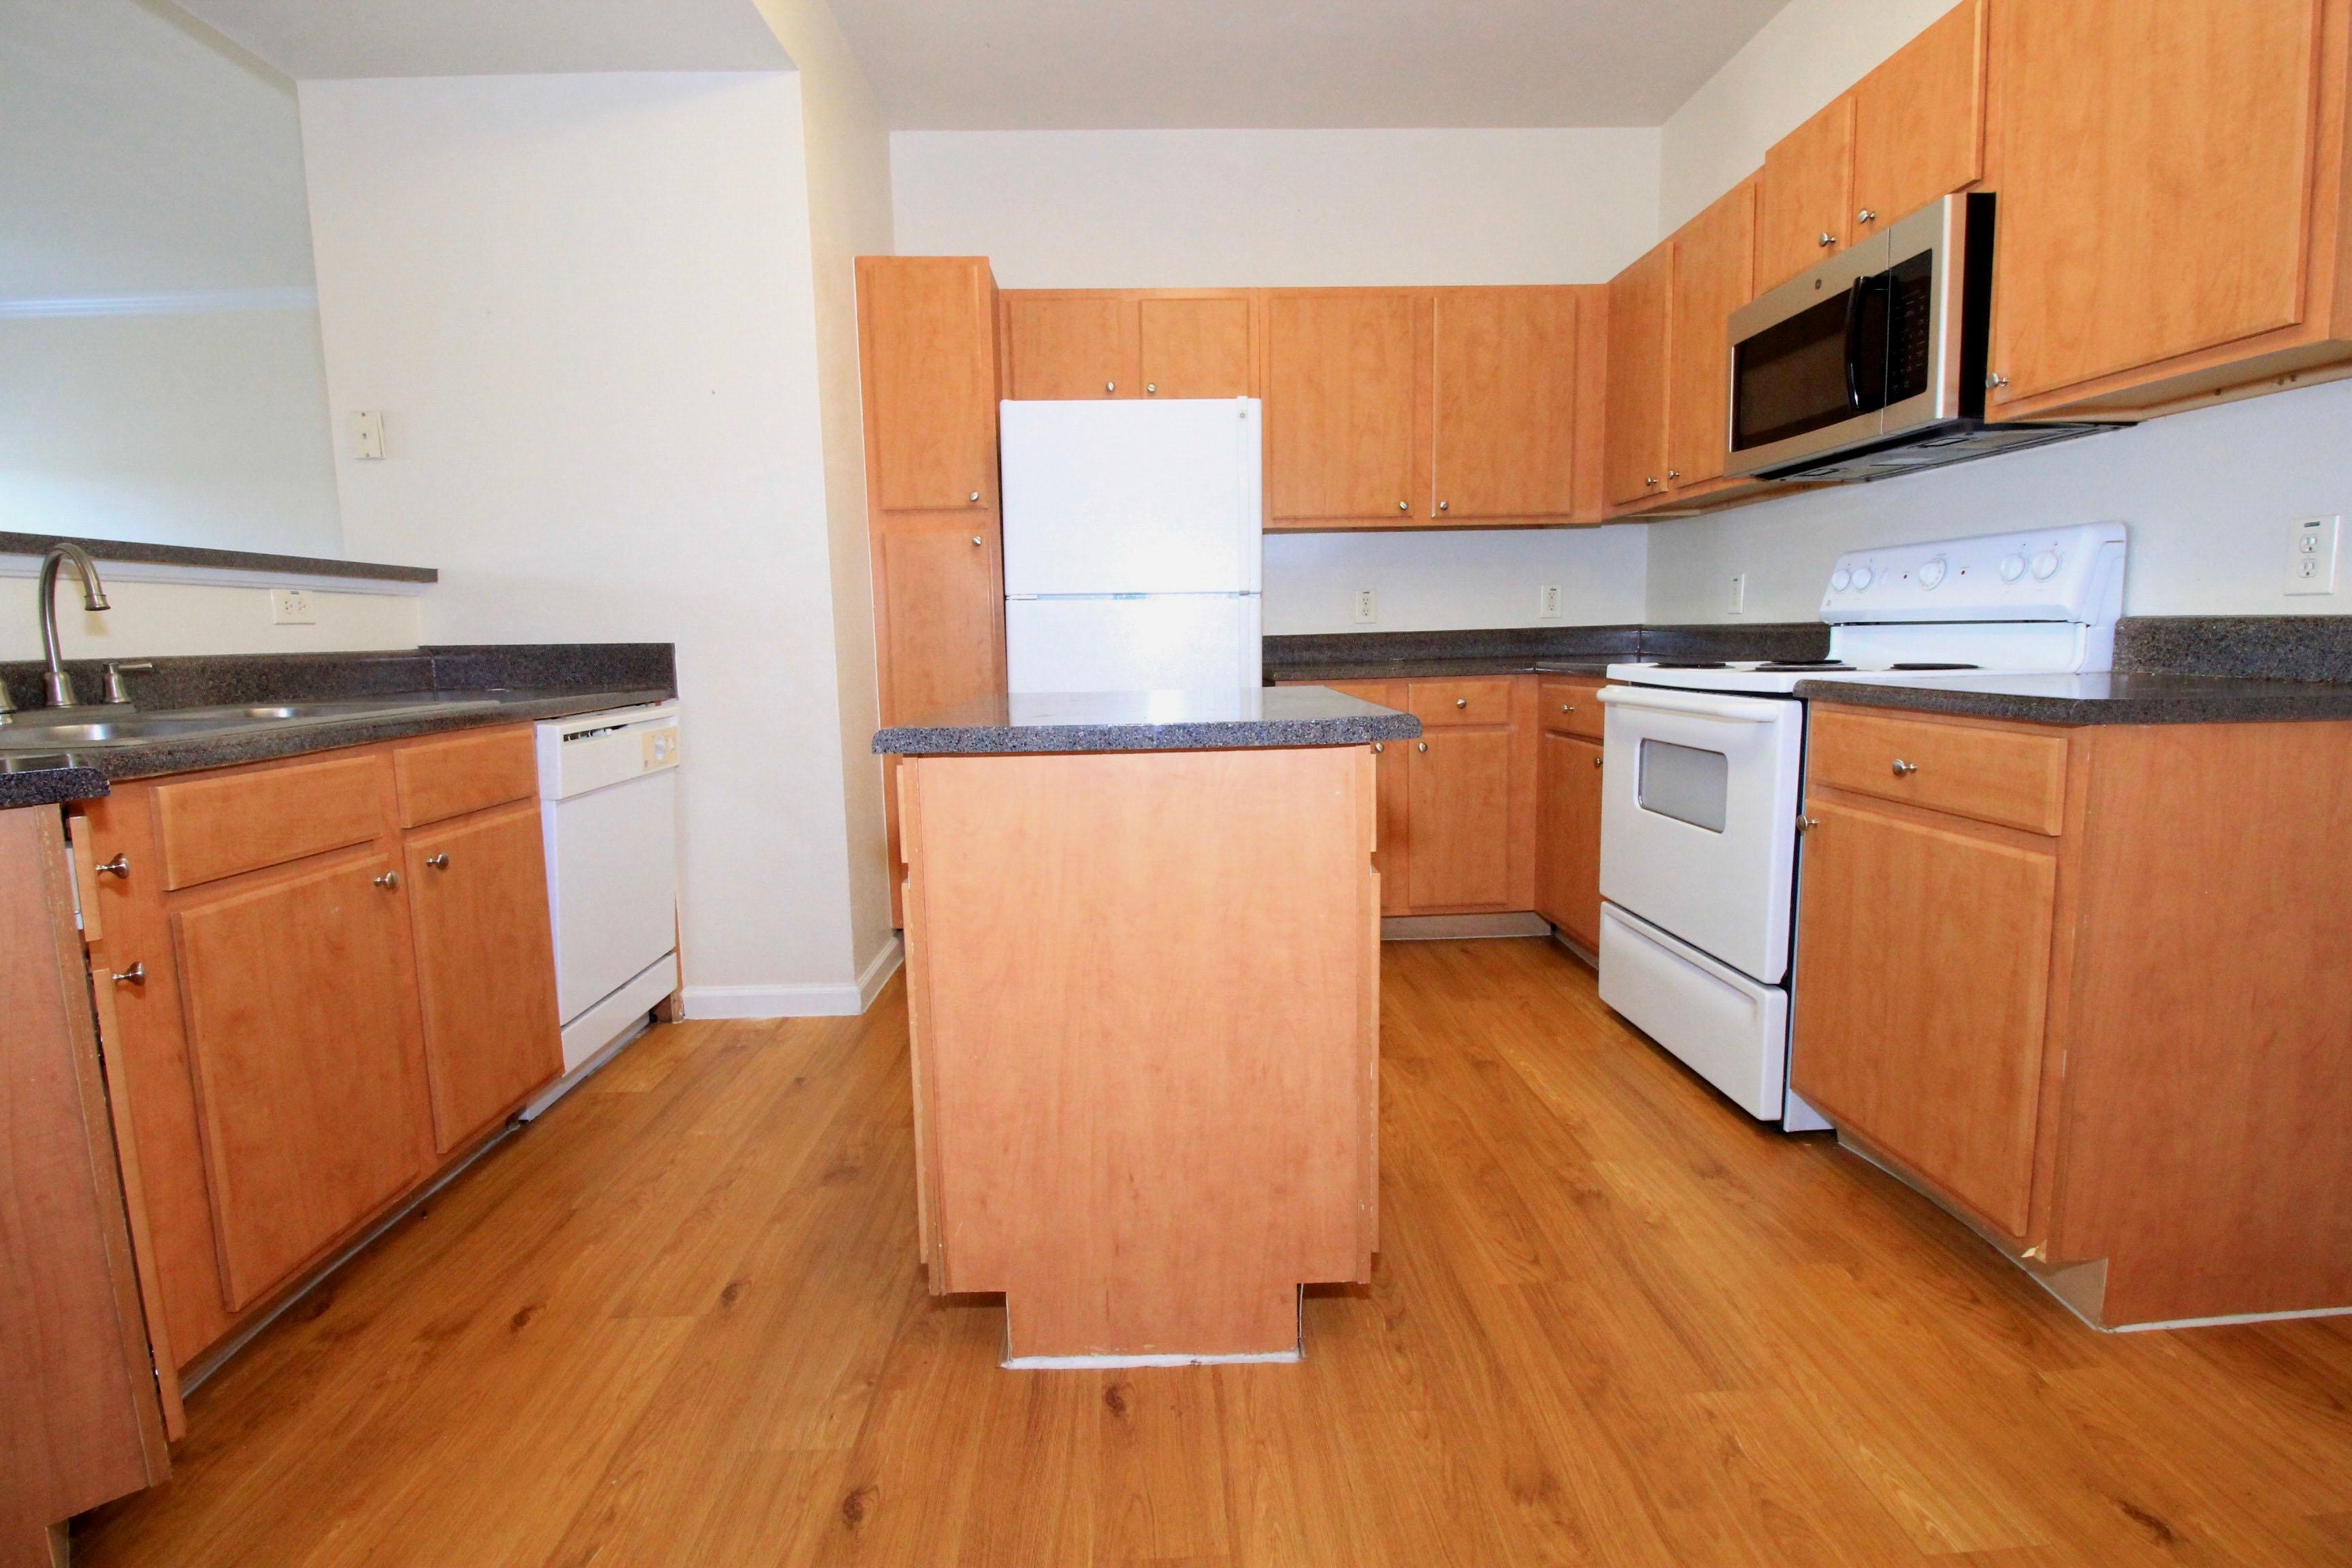 Kitchen Classic Upgrade at The Oxford at Estonia Apartments in San Antonio, TX